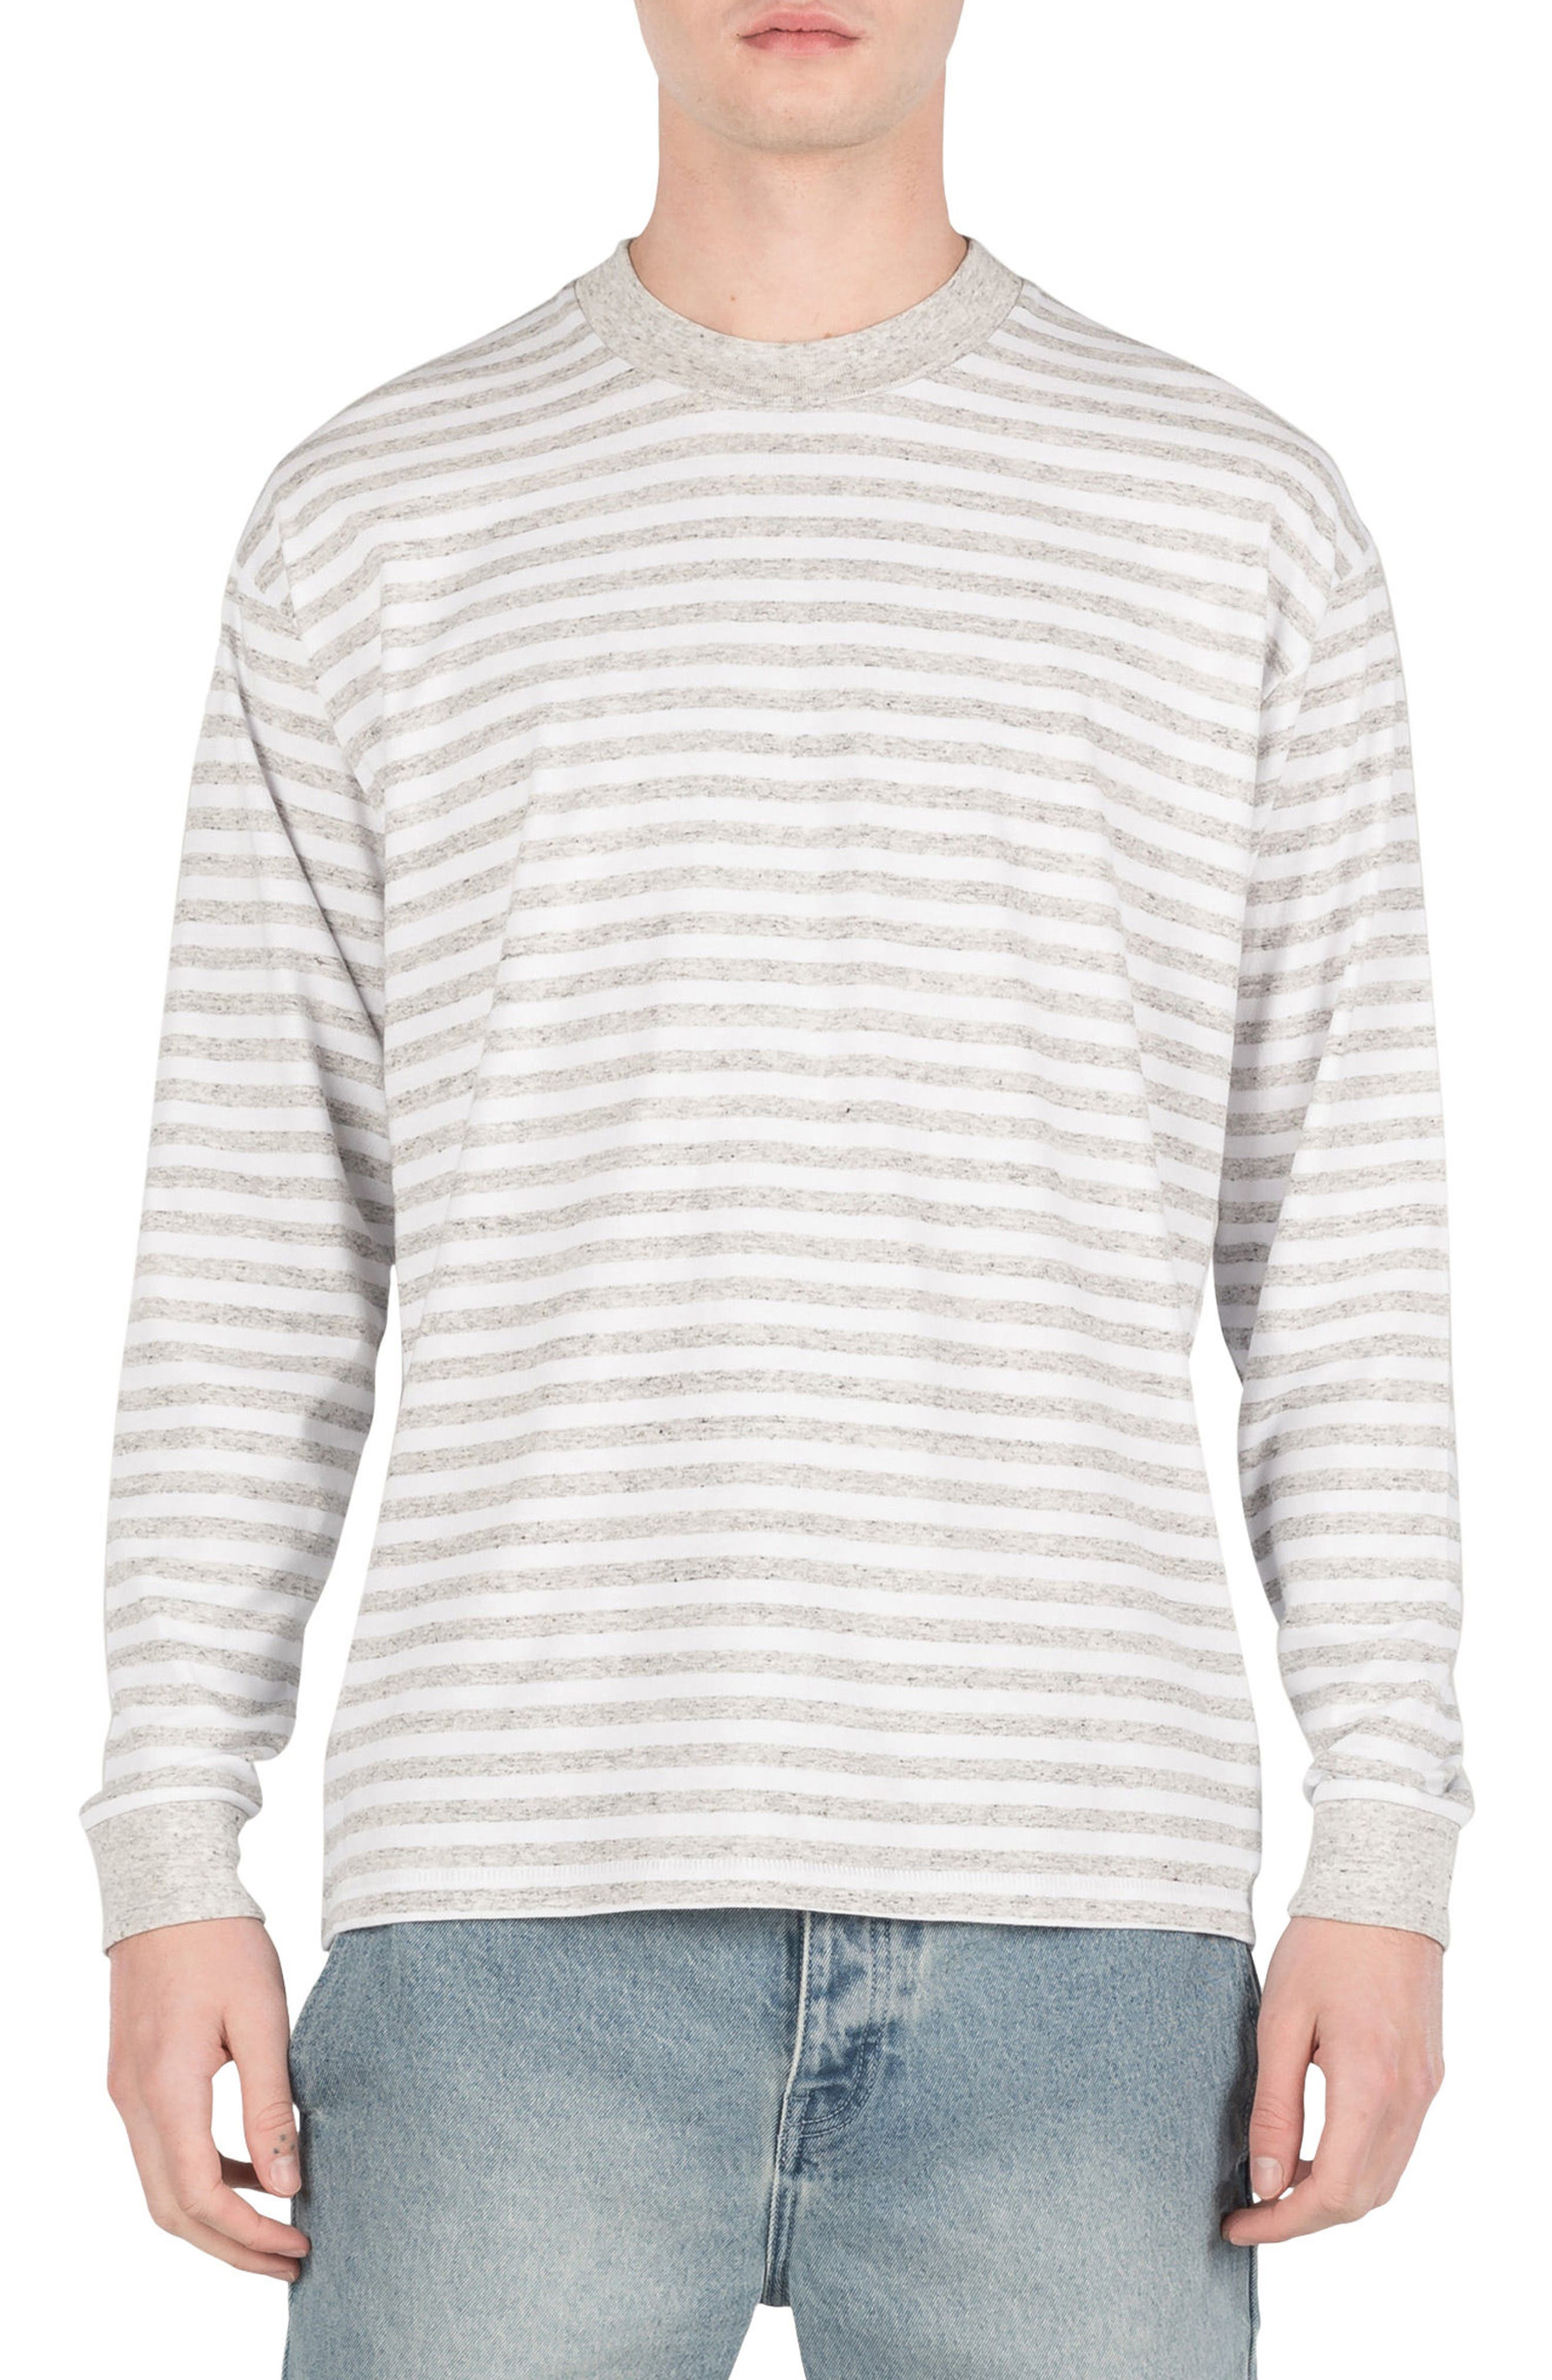 Box Long Sleeve T-Shirt,                             Main thumbnail 1, color,                             White/ Storm Marle